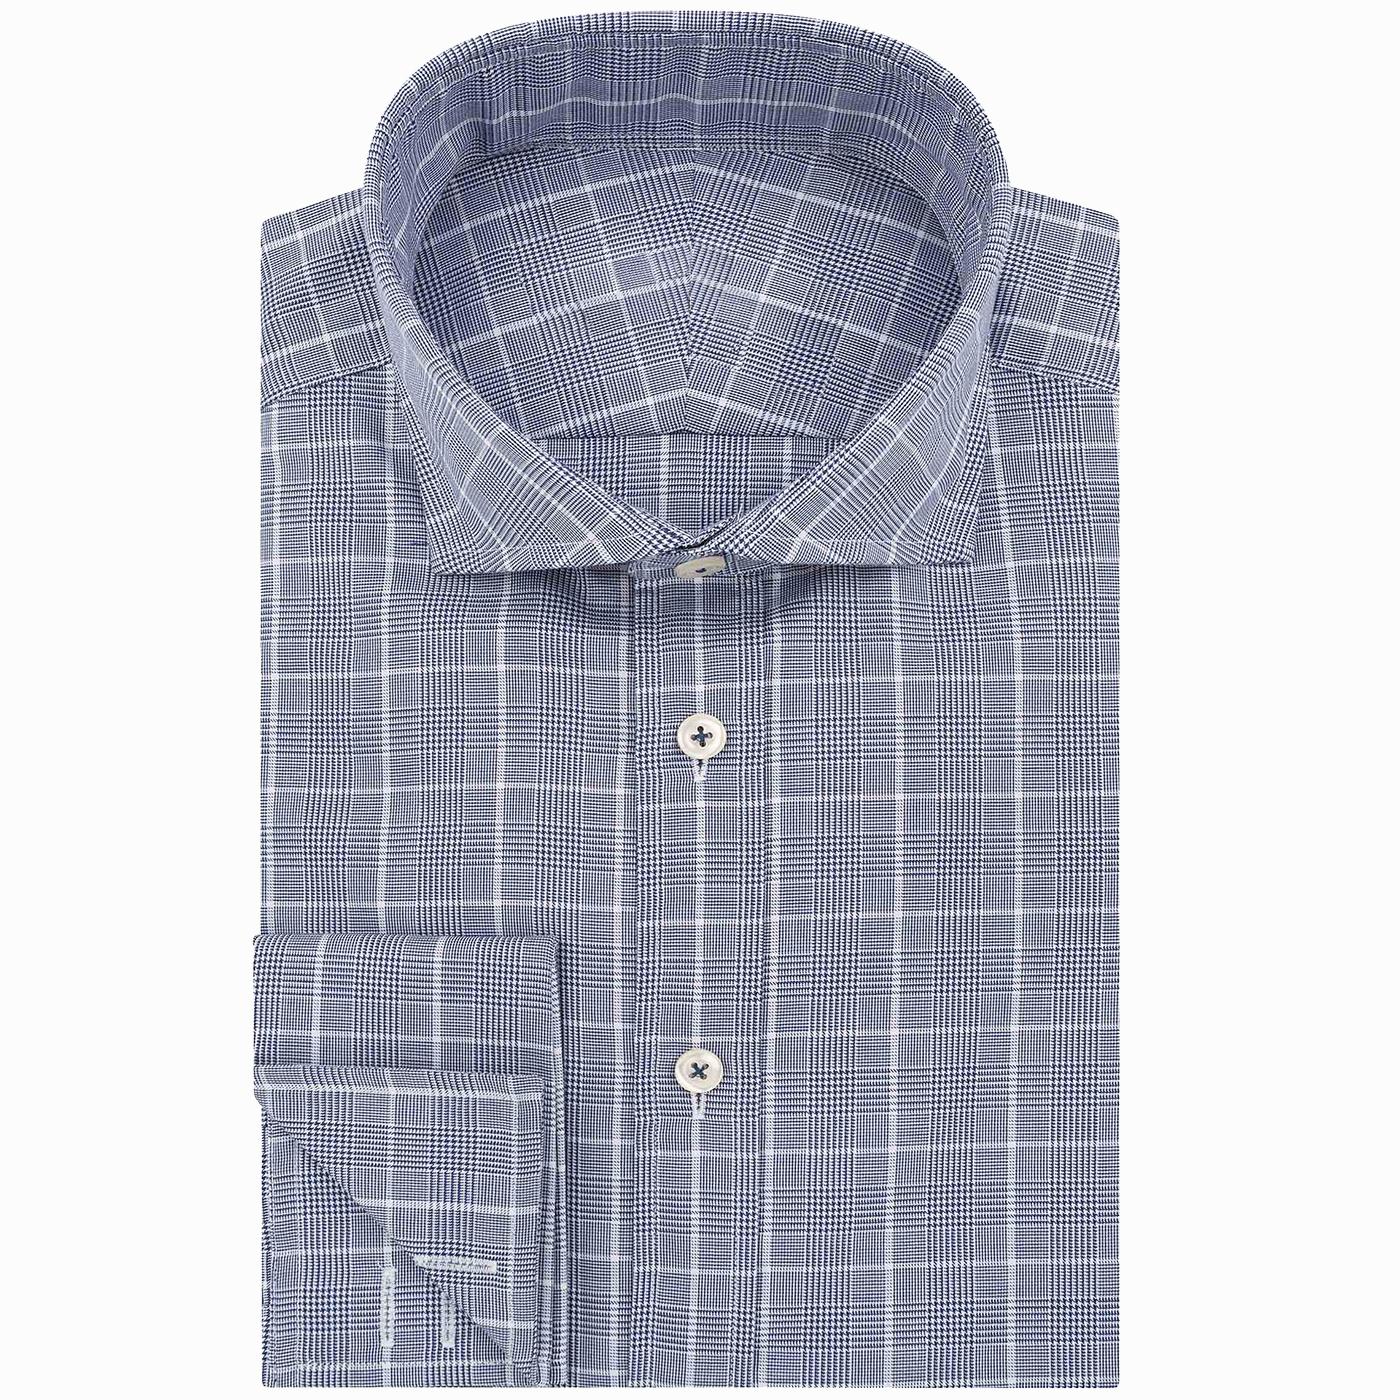 Shirt_16_Prince-of-wales_navy.jpg